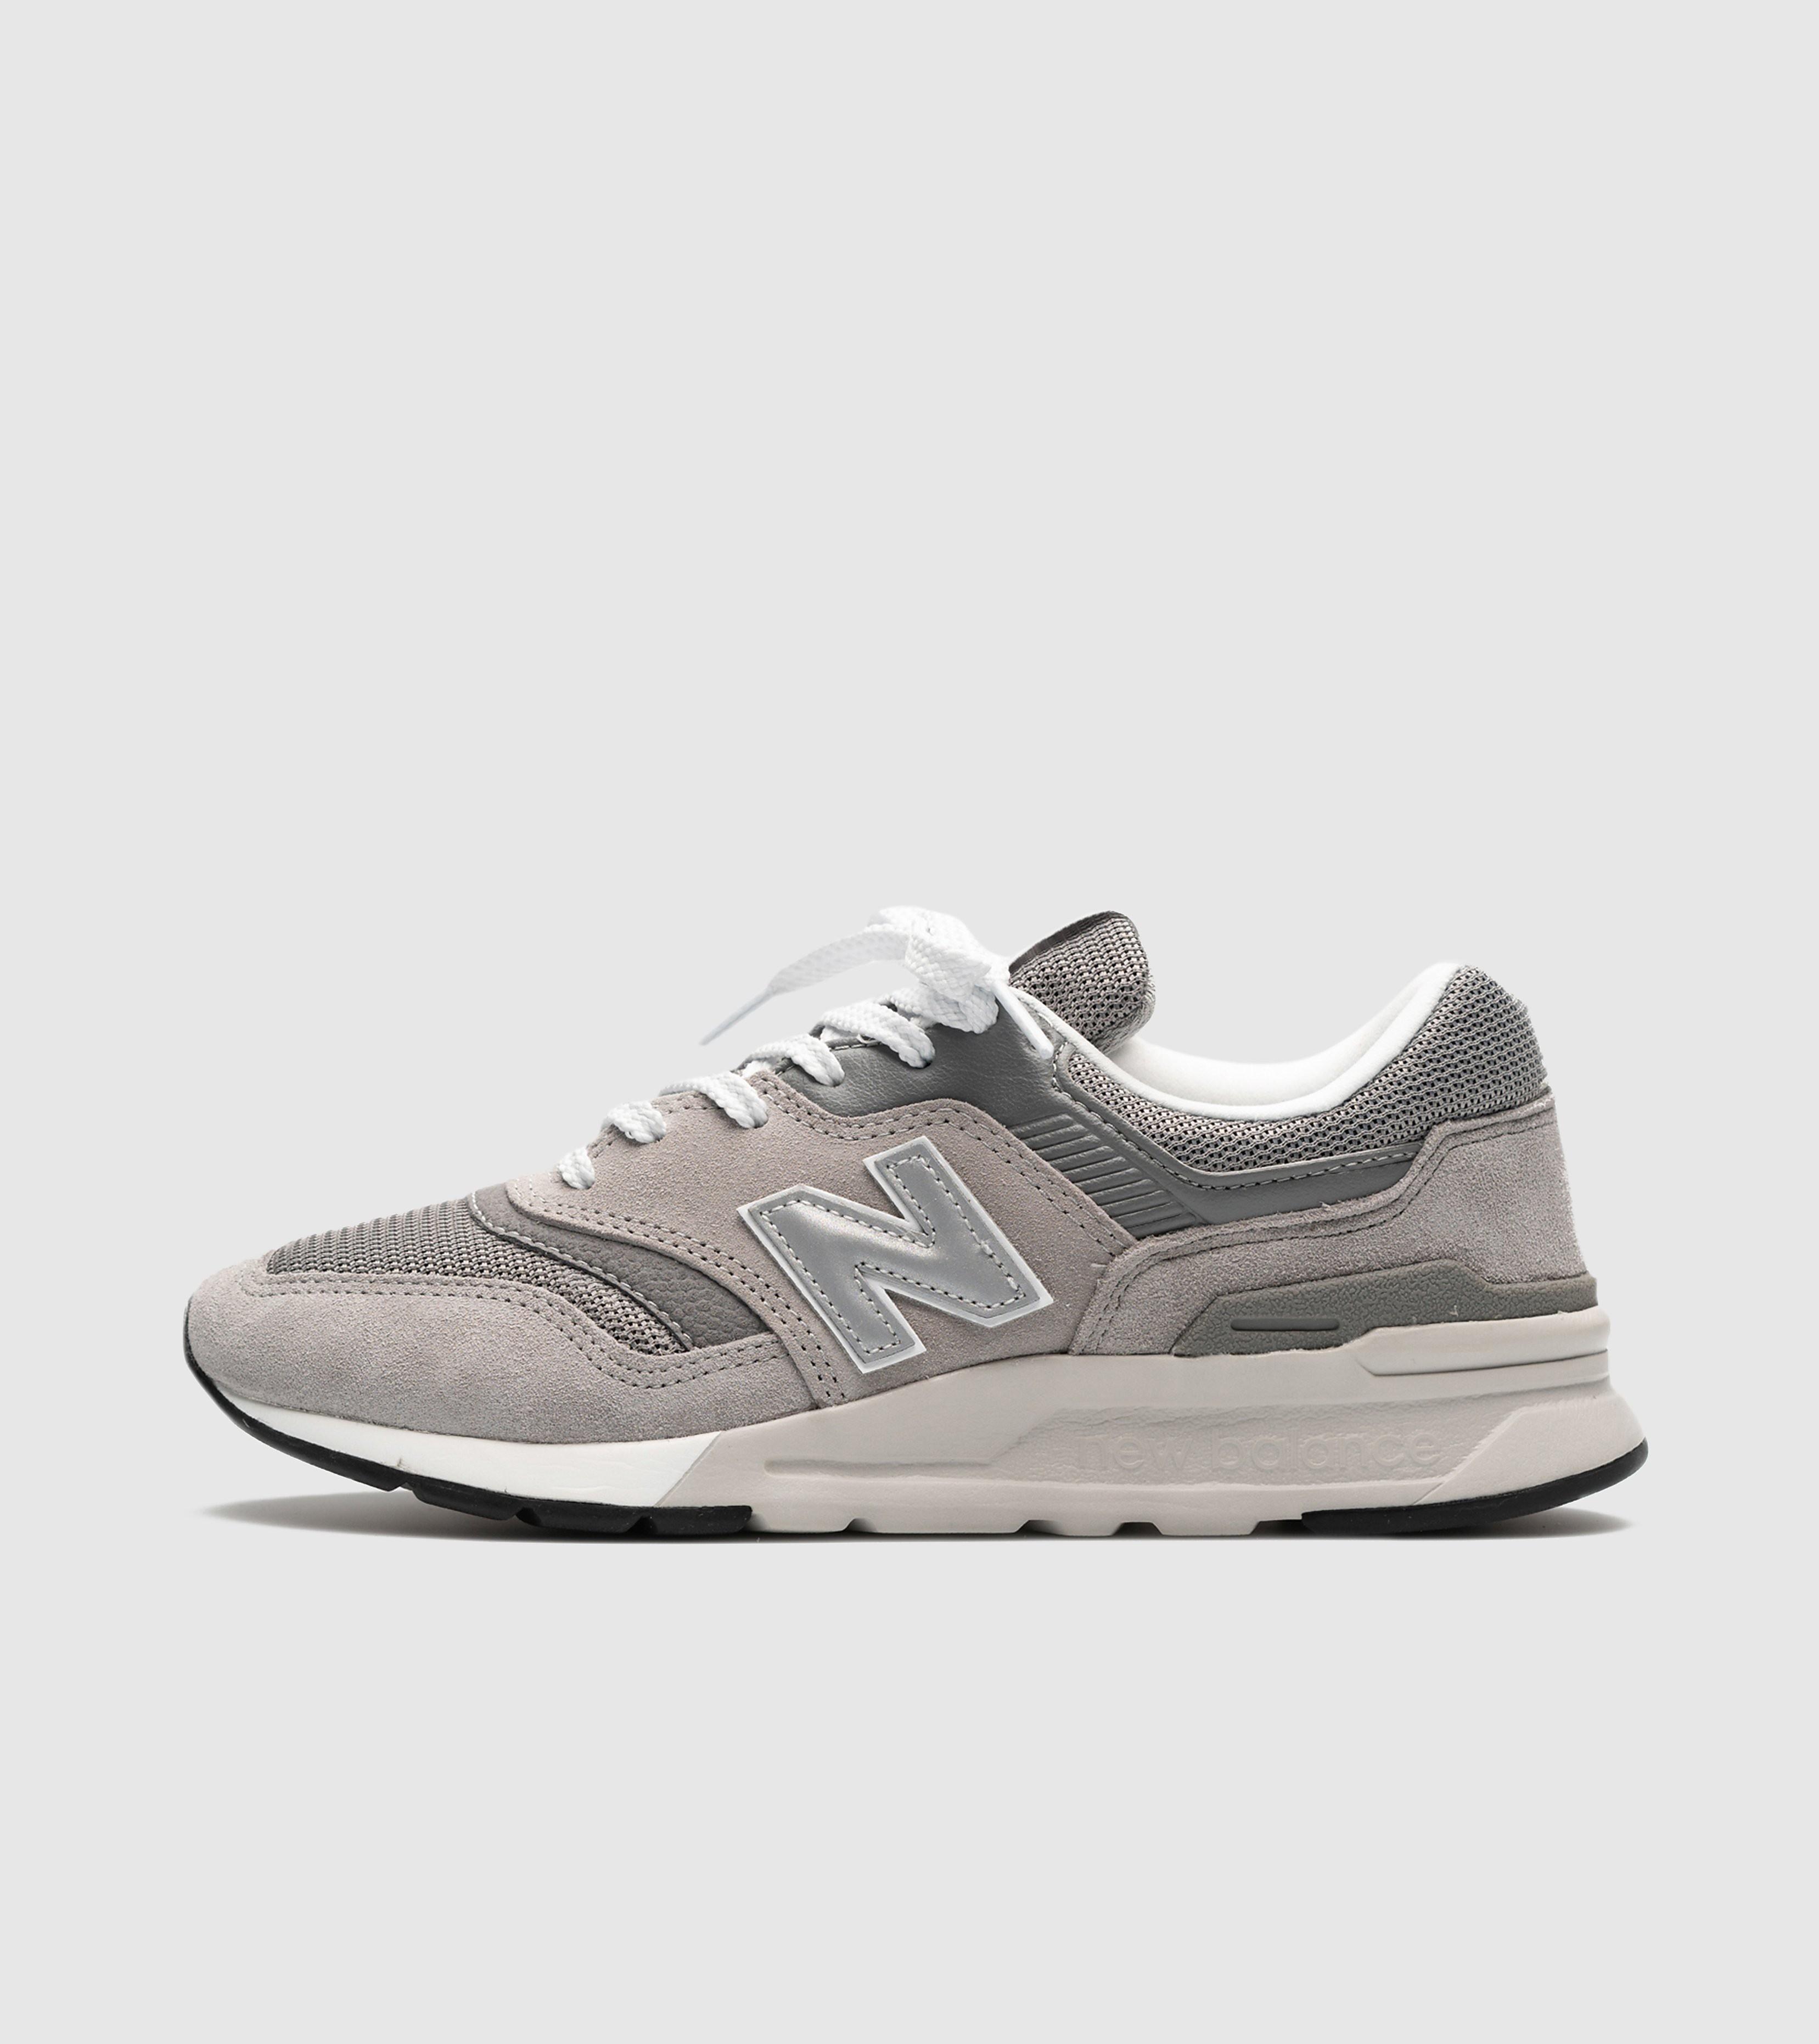 New Balance 997H Women's